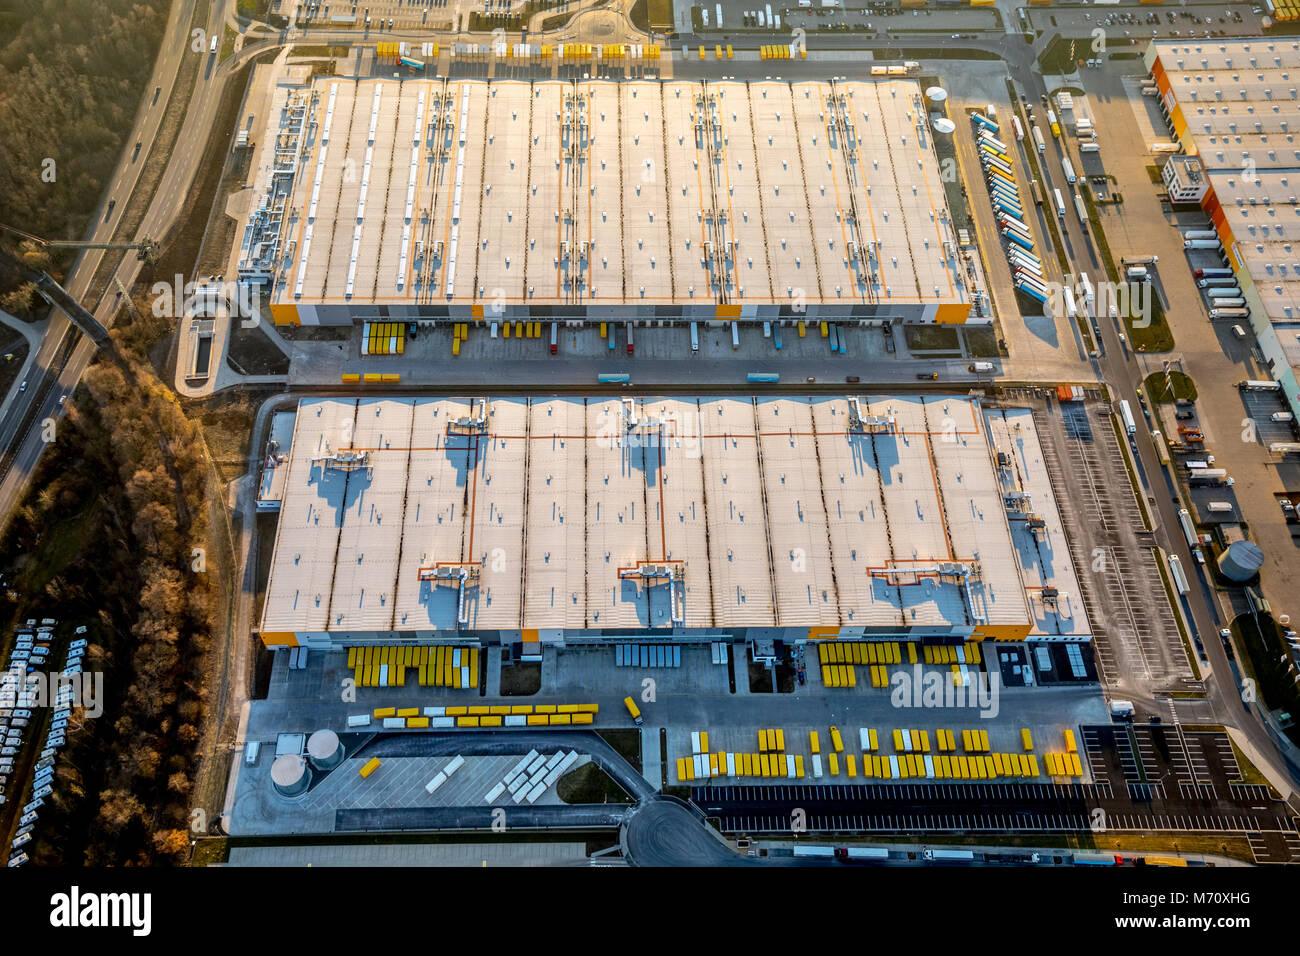 Amazon logistics center Dortmund, with car parking lot, between Brackeler road and Springorumstraße on the, - Stock Image